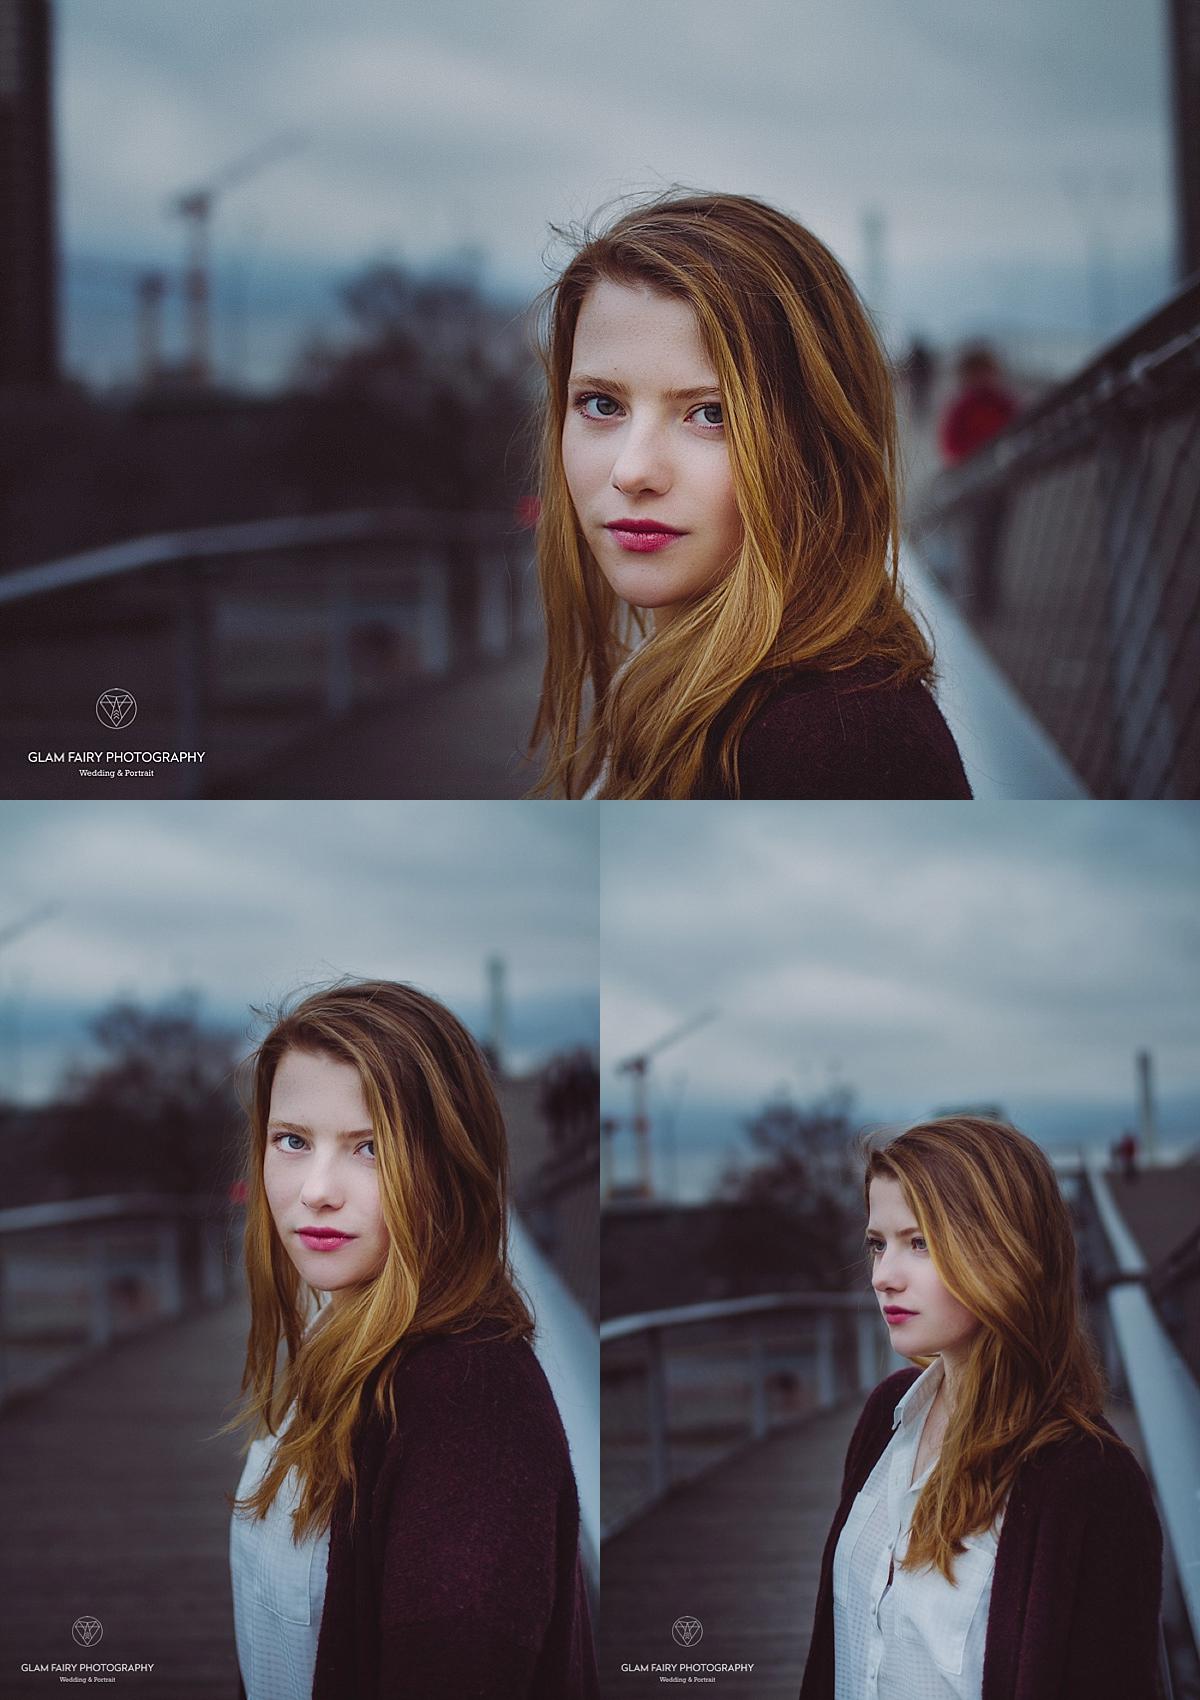 GlamFairyPhotography-seance-portrait-femme-bnf-mona_1